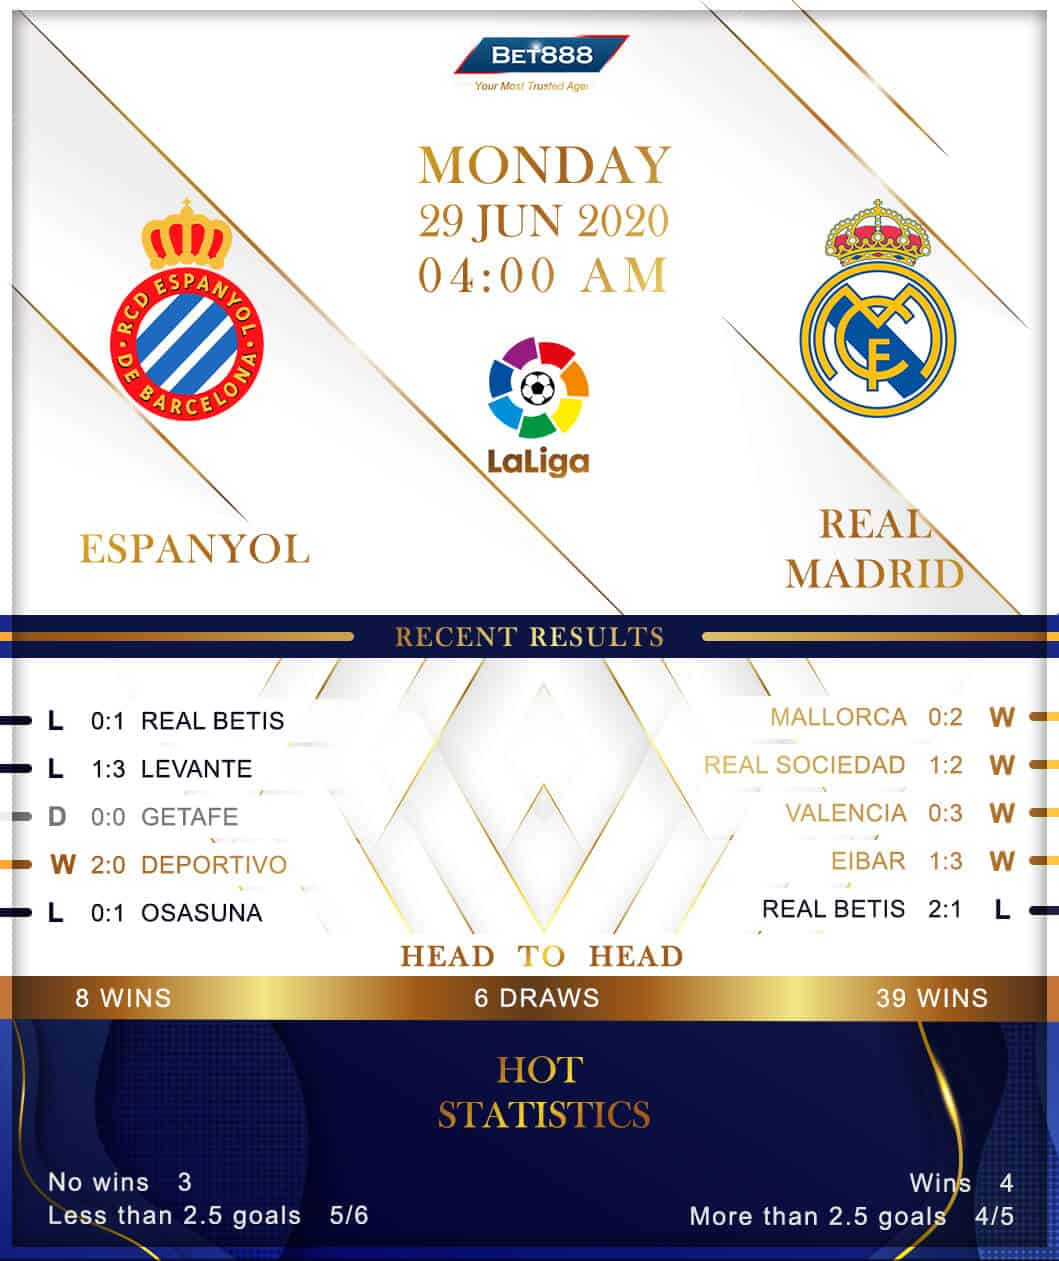 Espanyol vs  Real Madrid 29/06/20